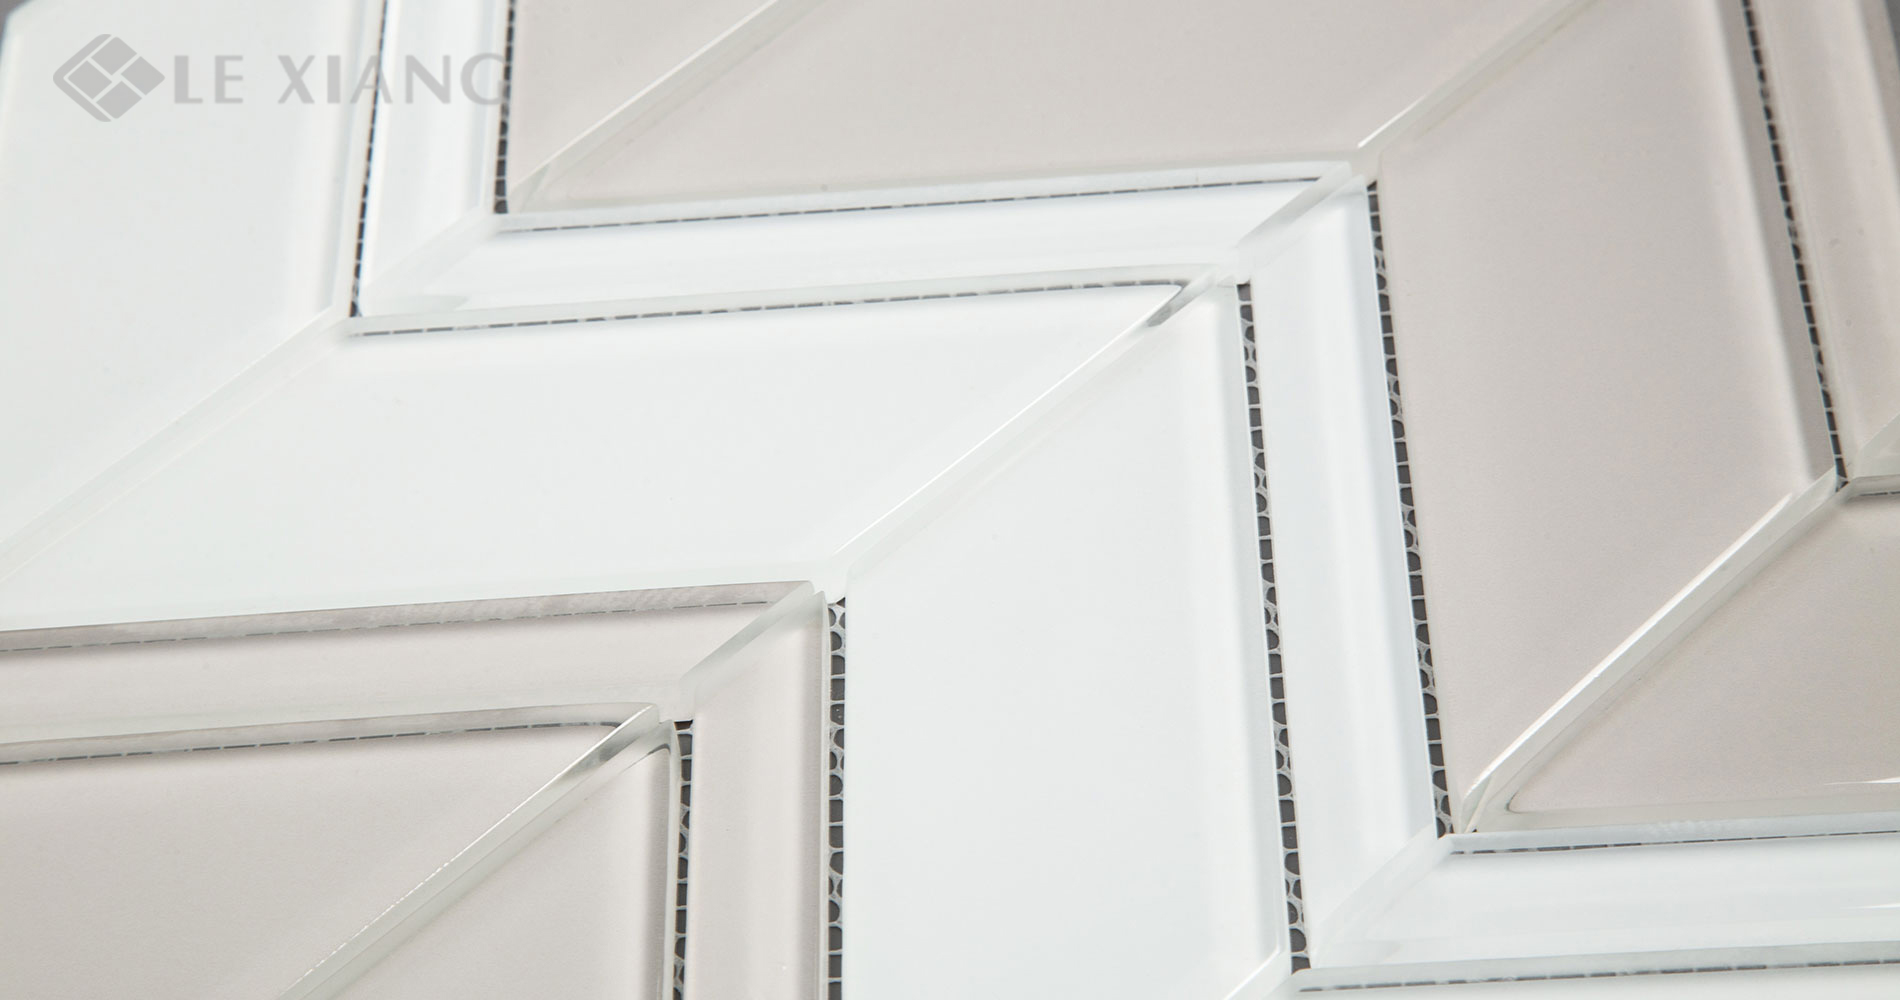 Blends-Chevron-Kitchen-Backsplash-Crystal-Glass-Mosaics-Tile-7